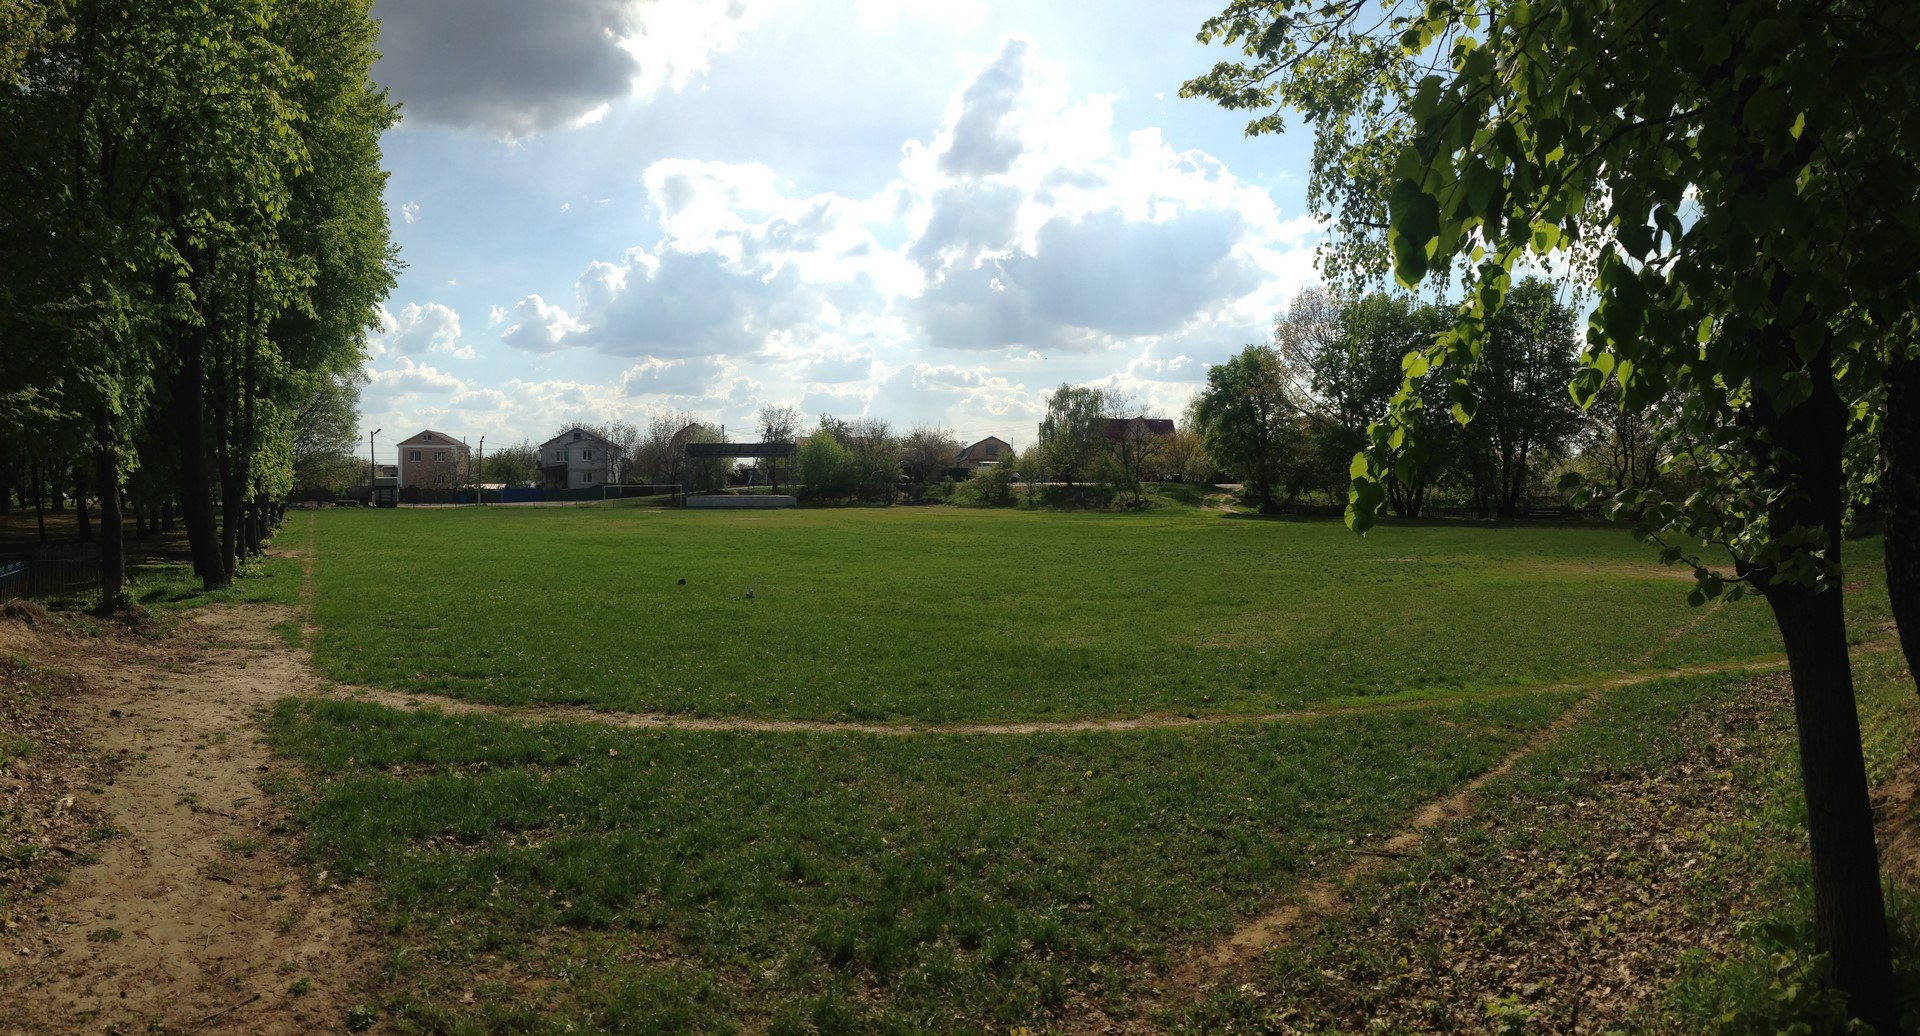 park iHome 5